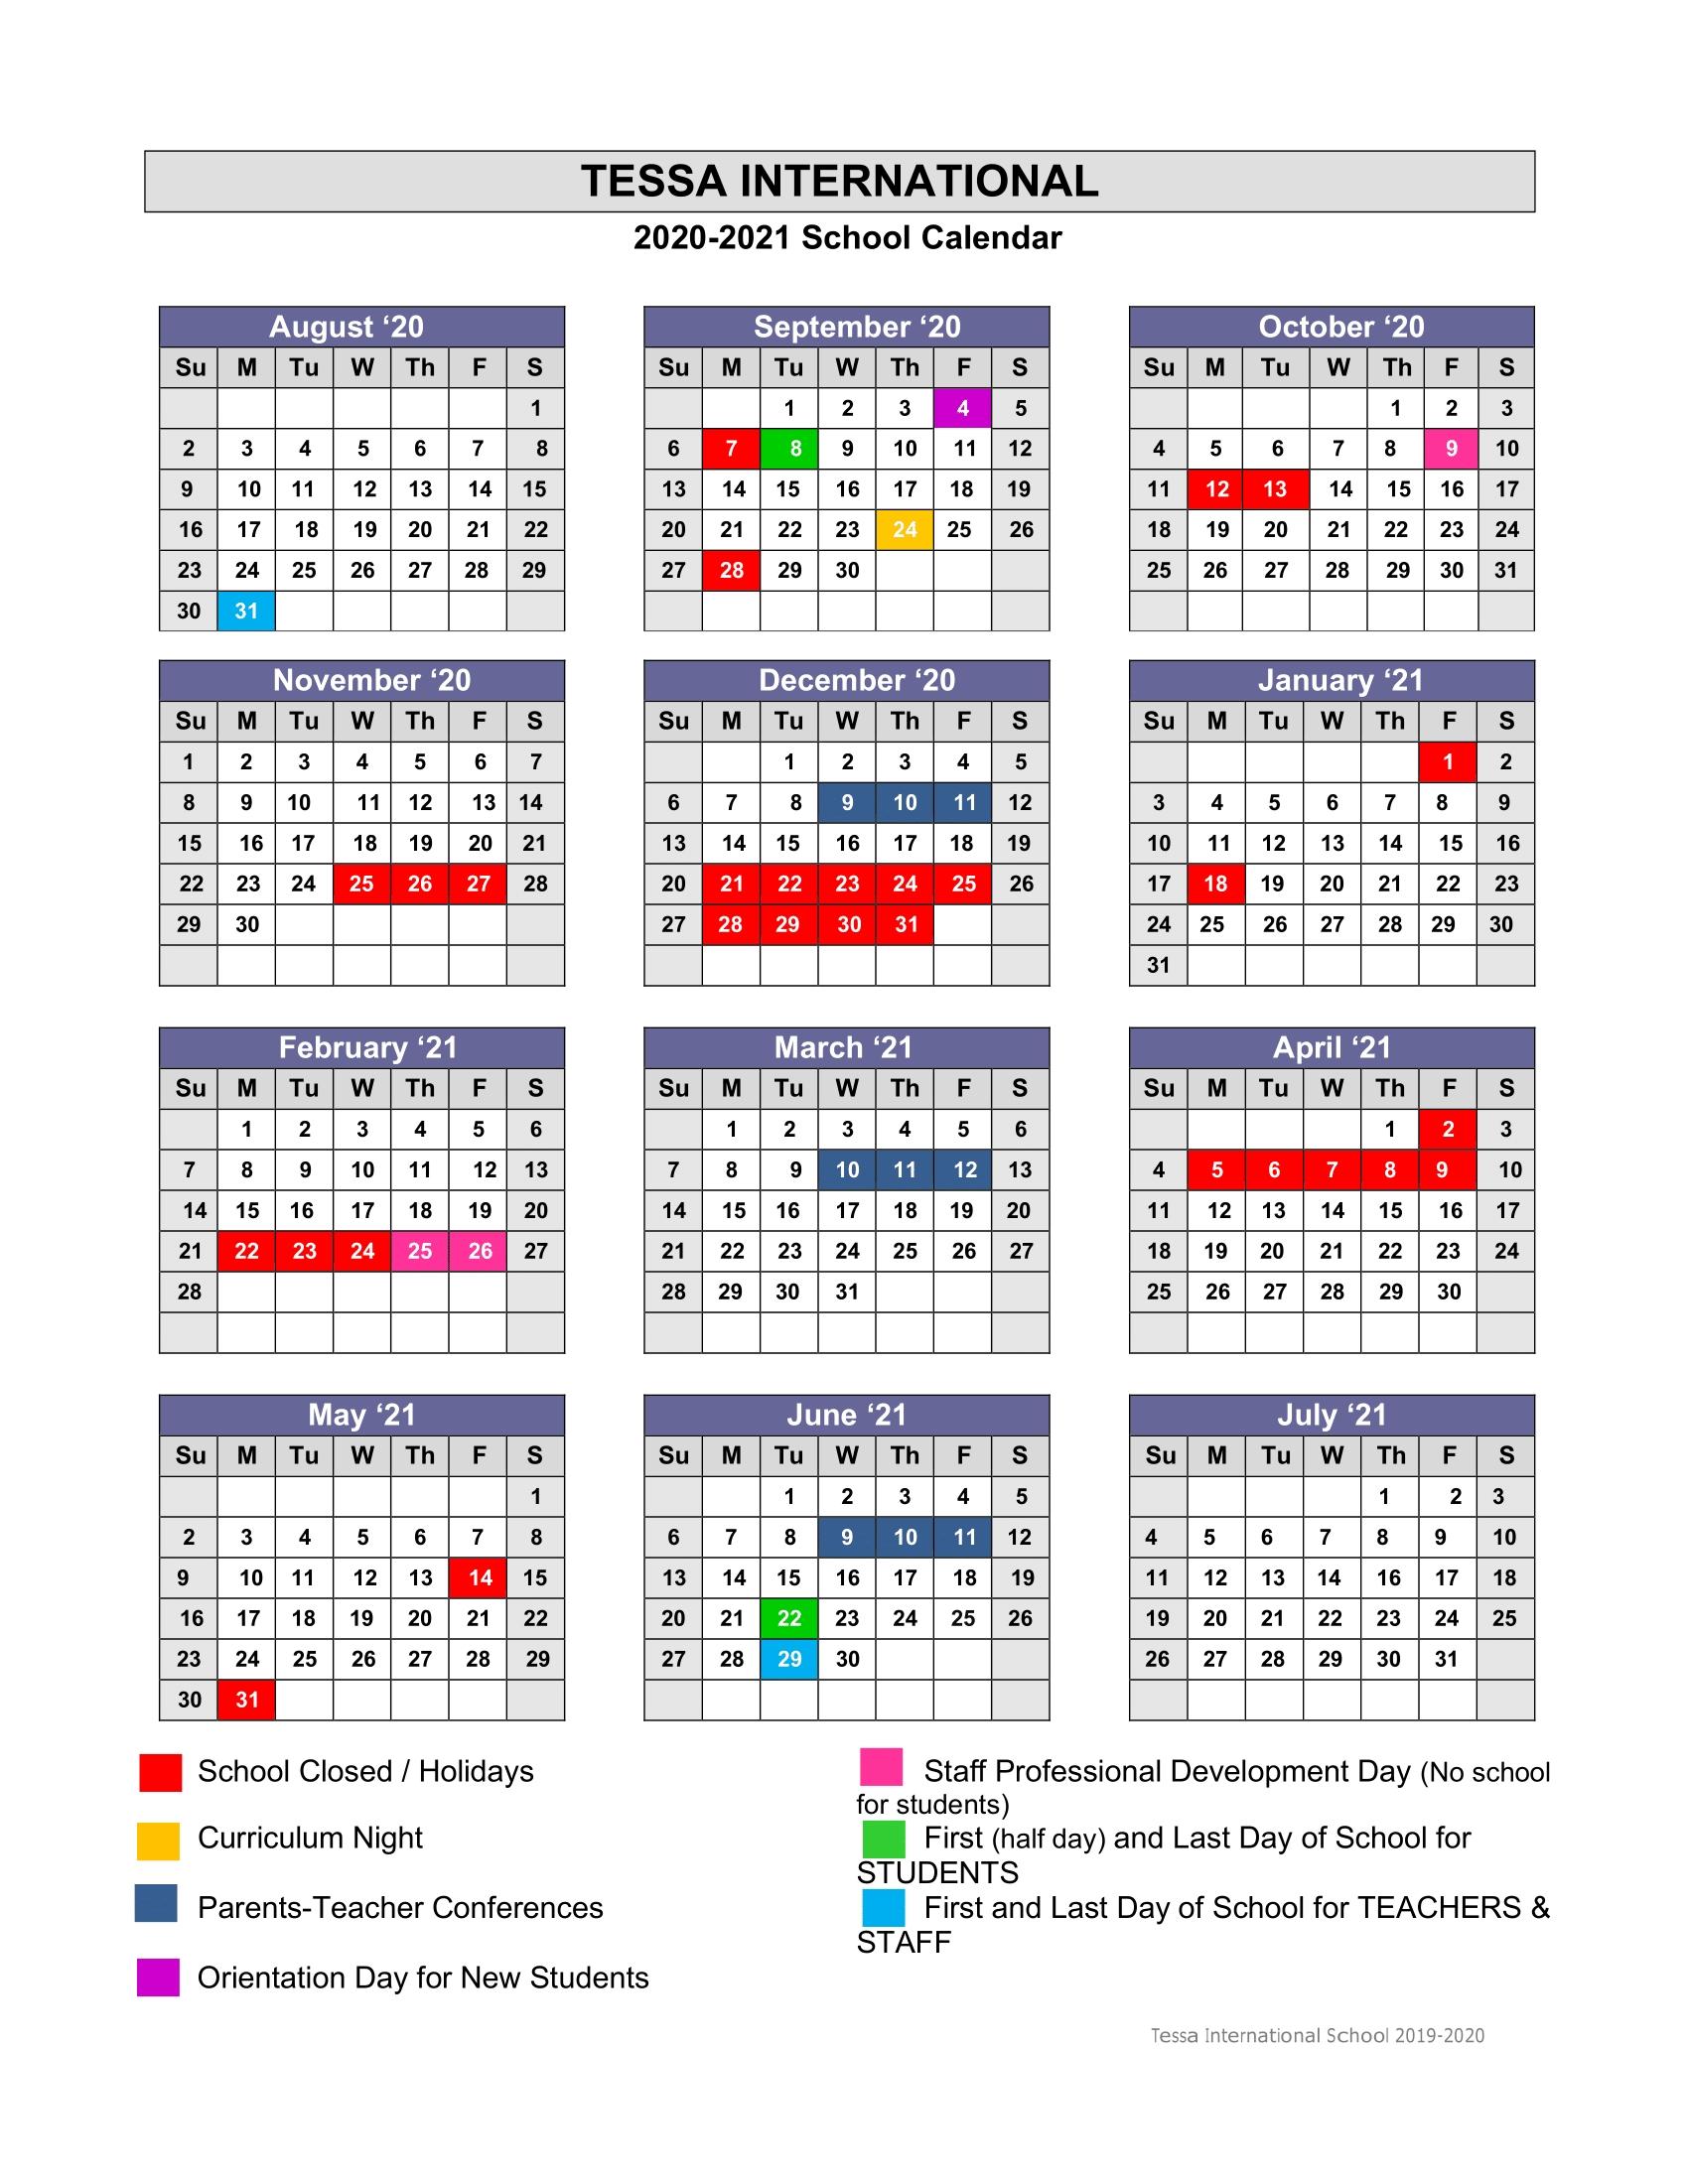 Fordham University Acasemic Calendar Spring 2020 | Get For University Of Ri Academic Calendar 2021 2020